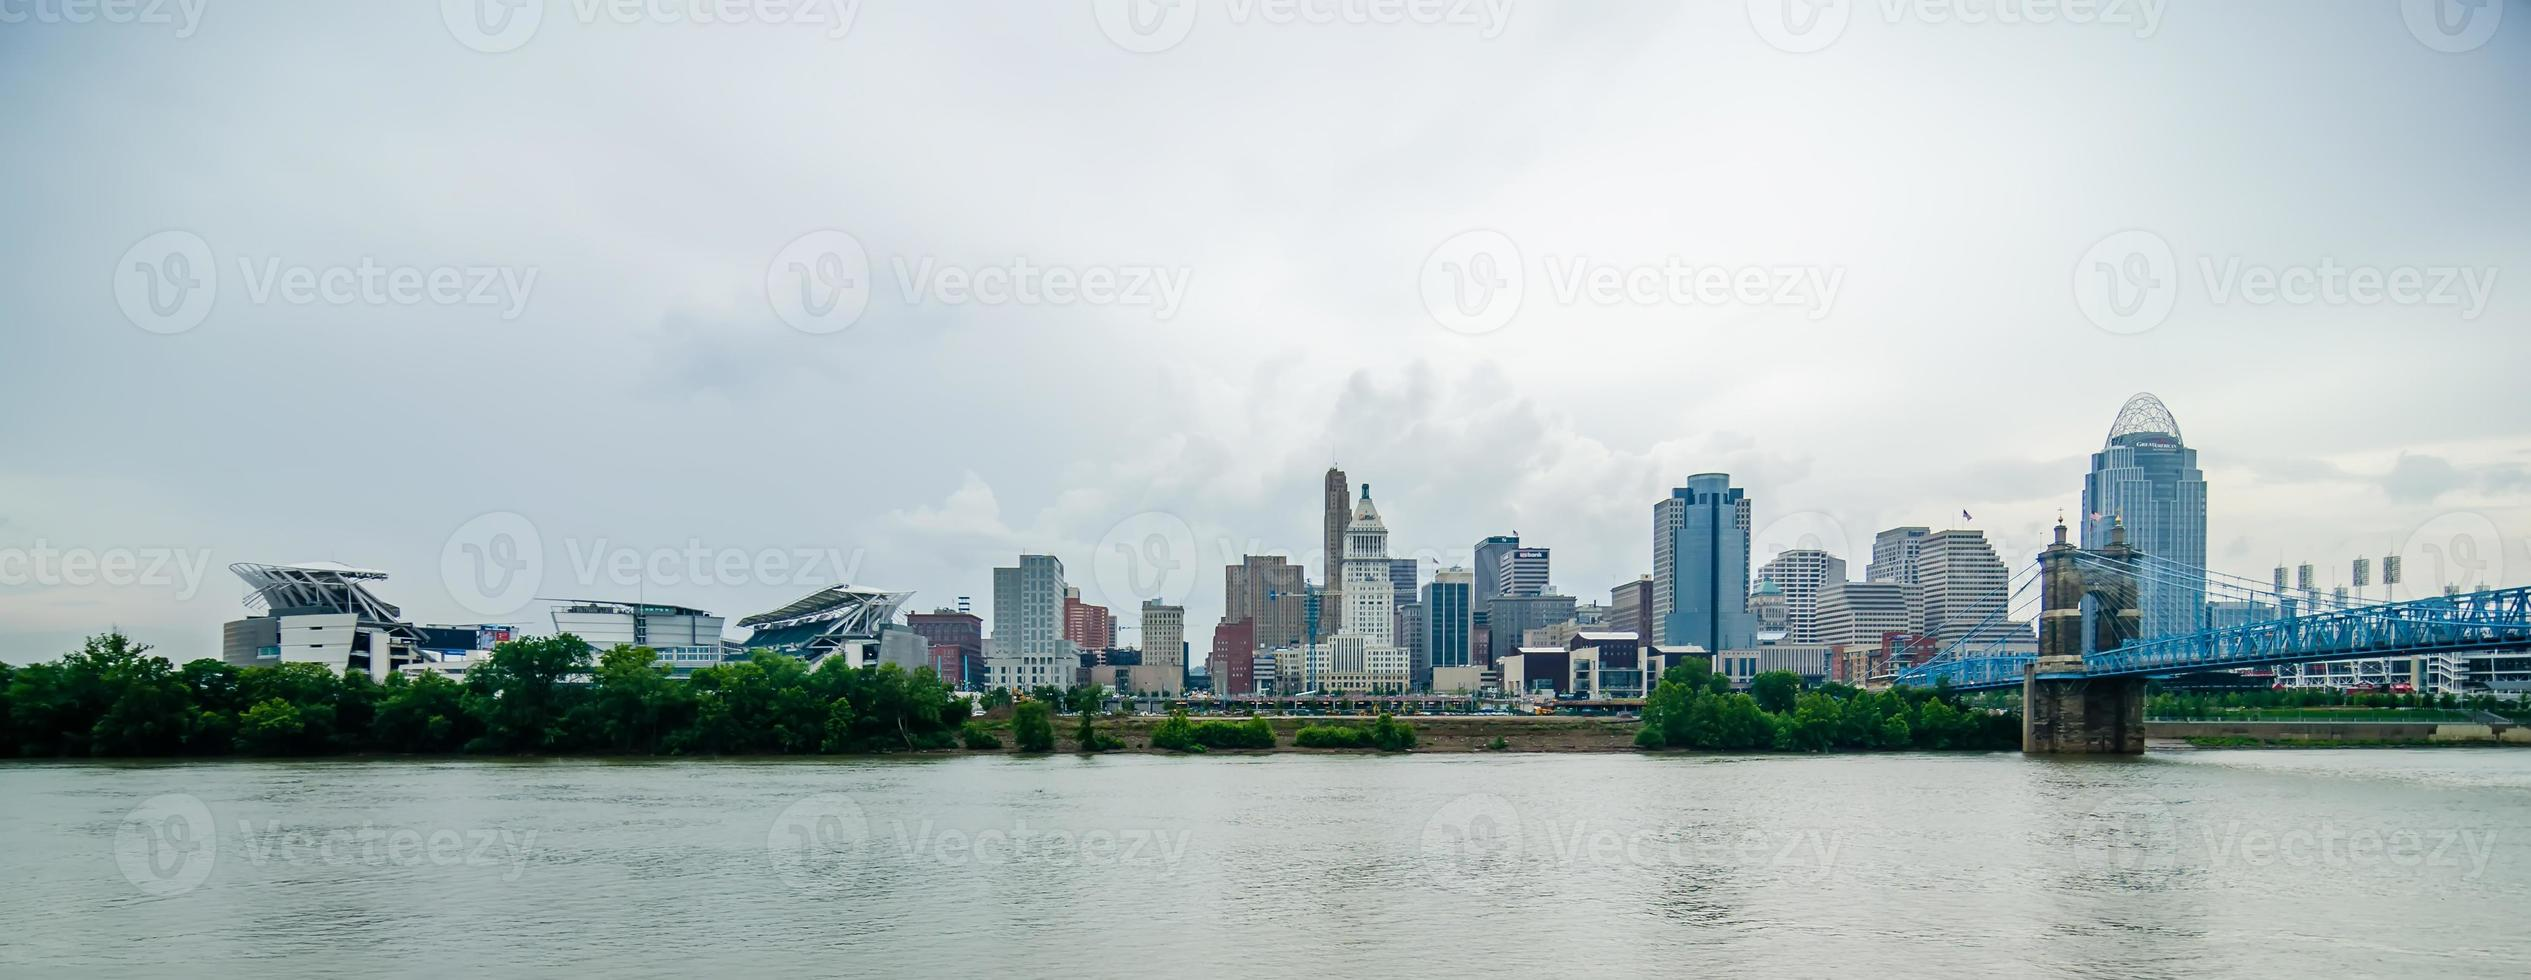 Skyline de Cincinnati et John historique a. pont suspendu de chevreuil photo